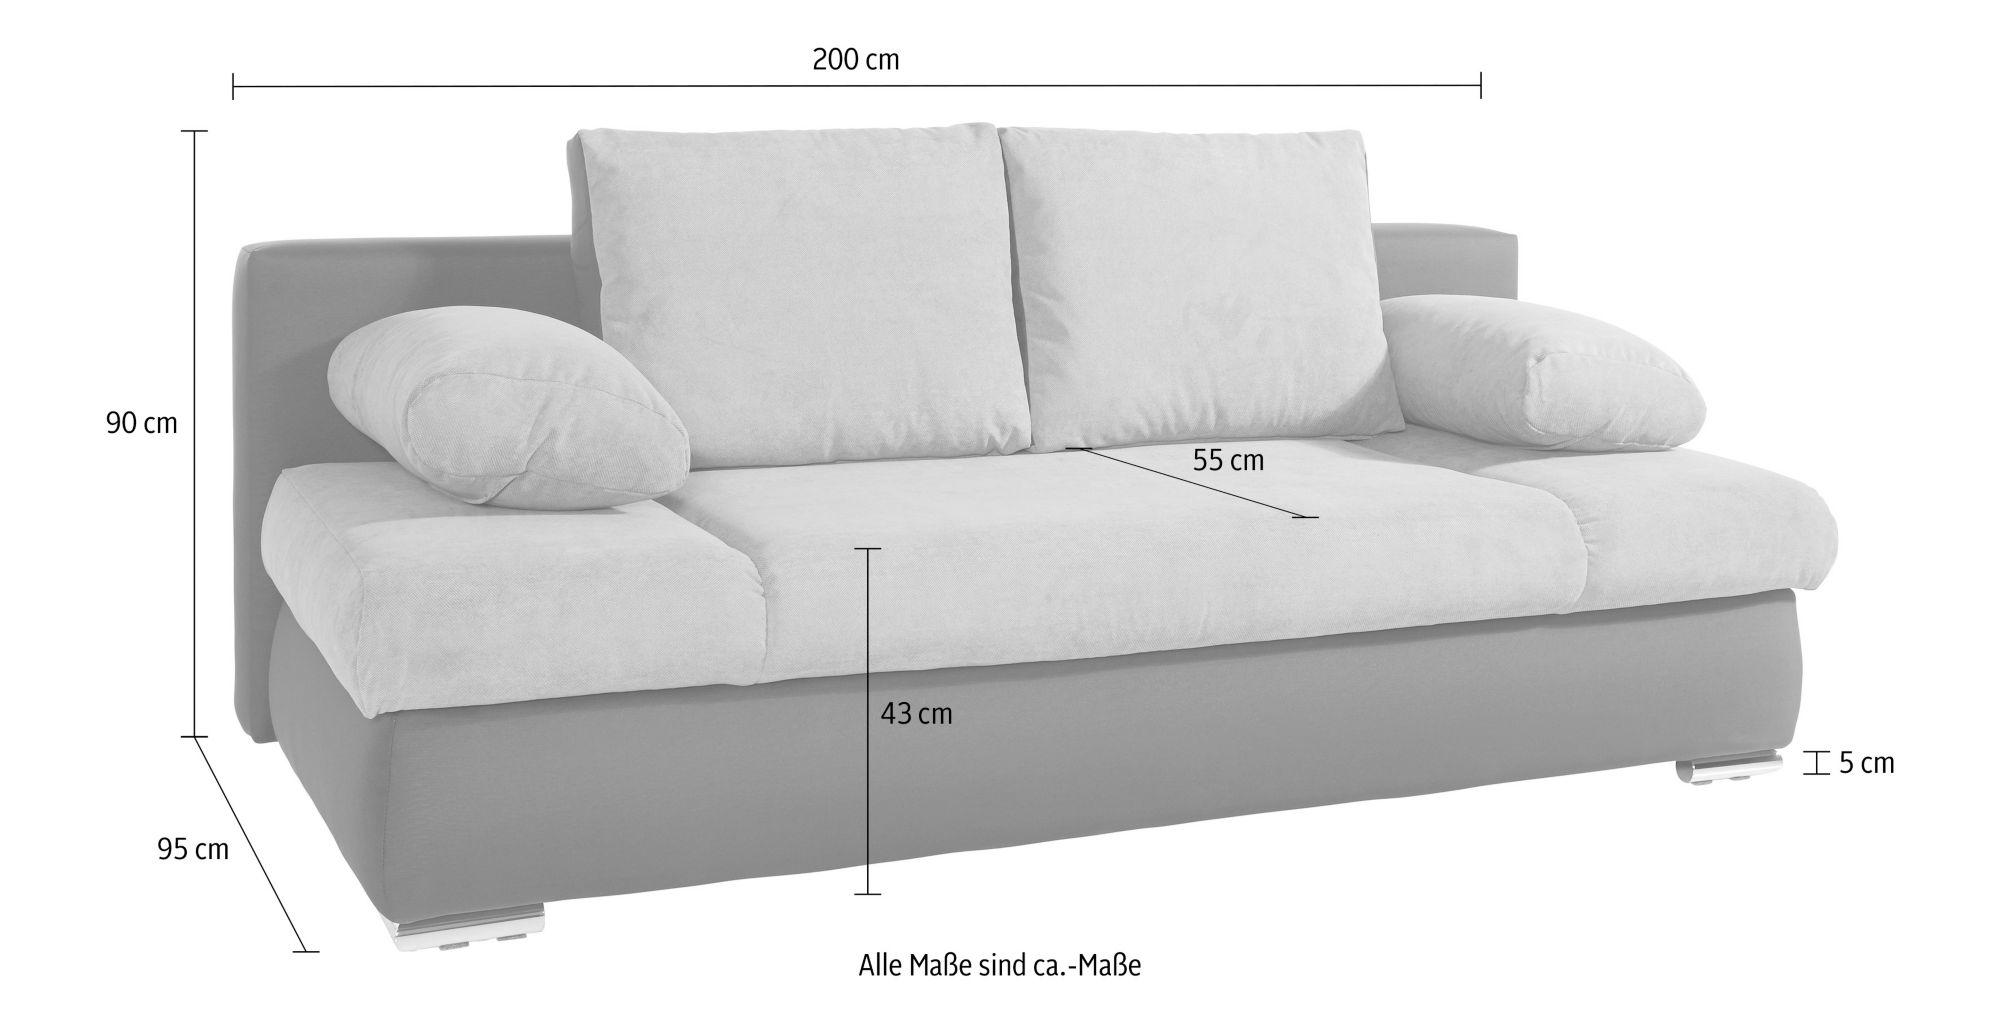 collection ab schlafsofa wahlweise mit federkern schwab. Black Bedroom Furniture Sets. Home Design Ideas